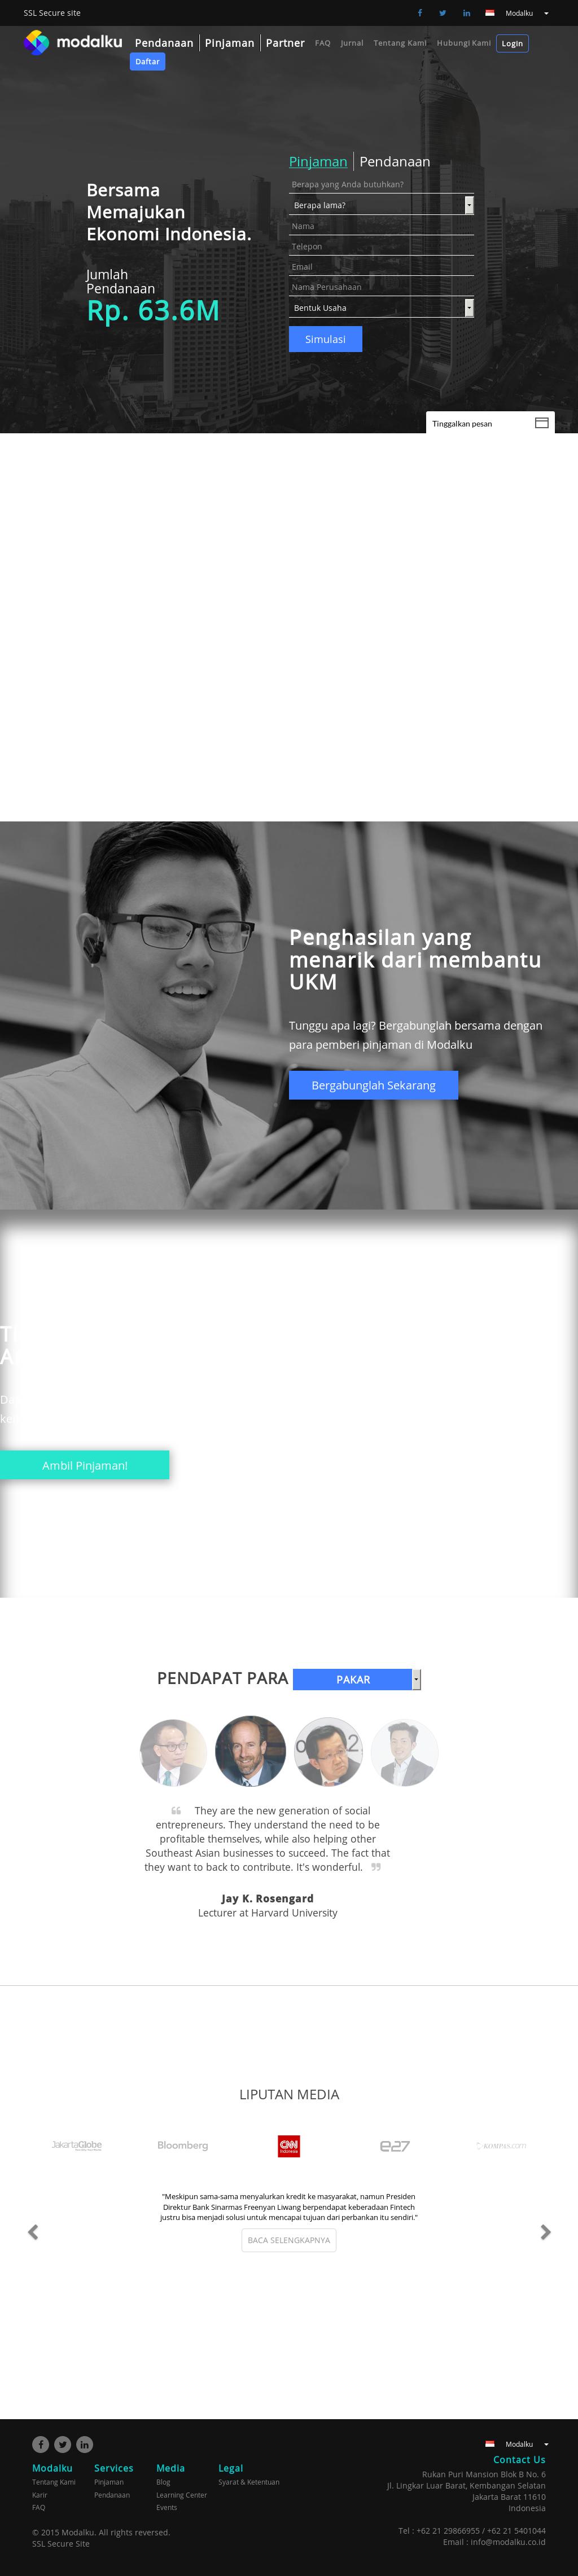 Modalku Competitors, Revenue and Employees - Owler Company Profile